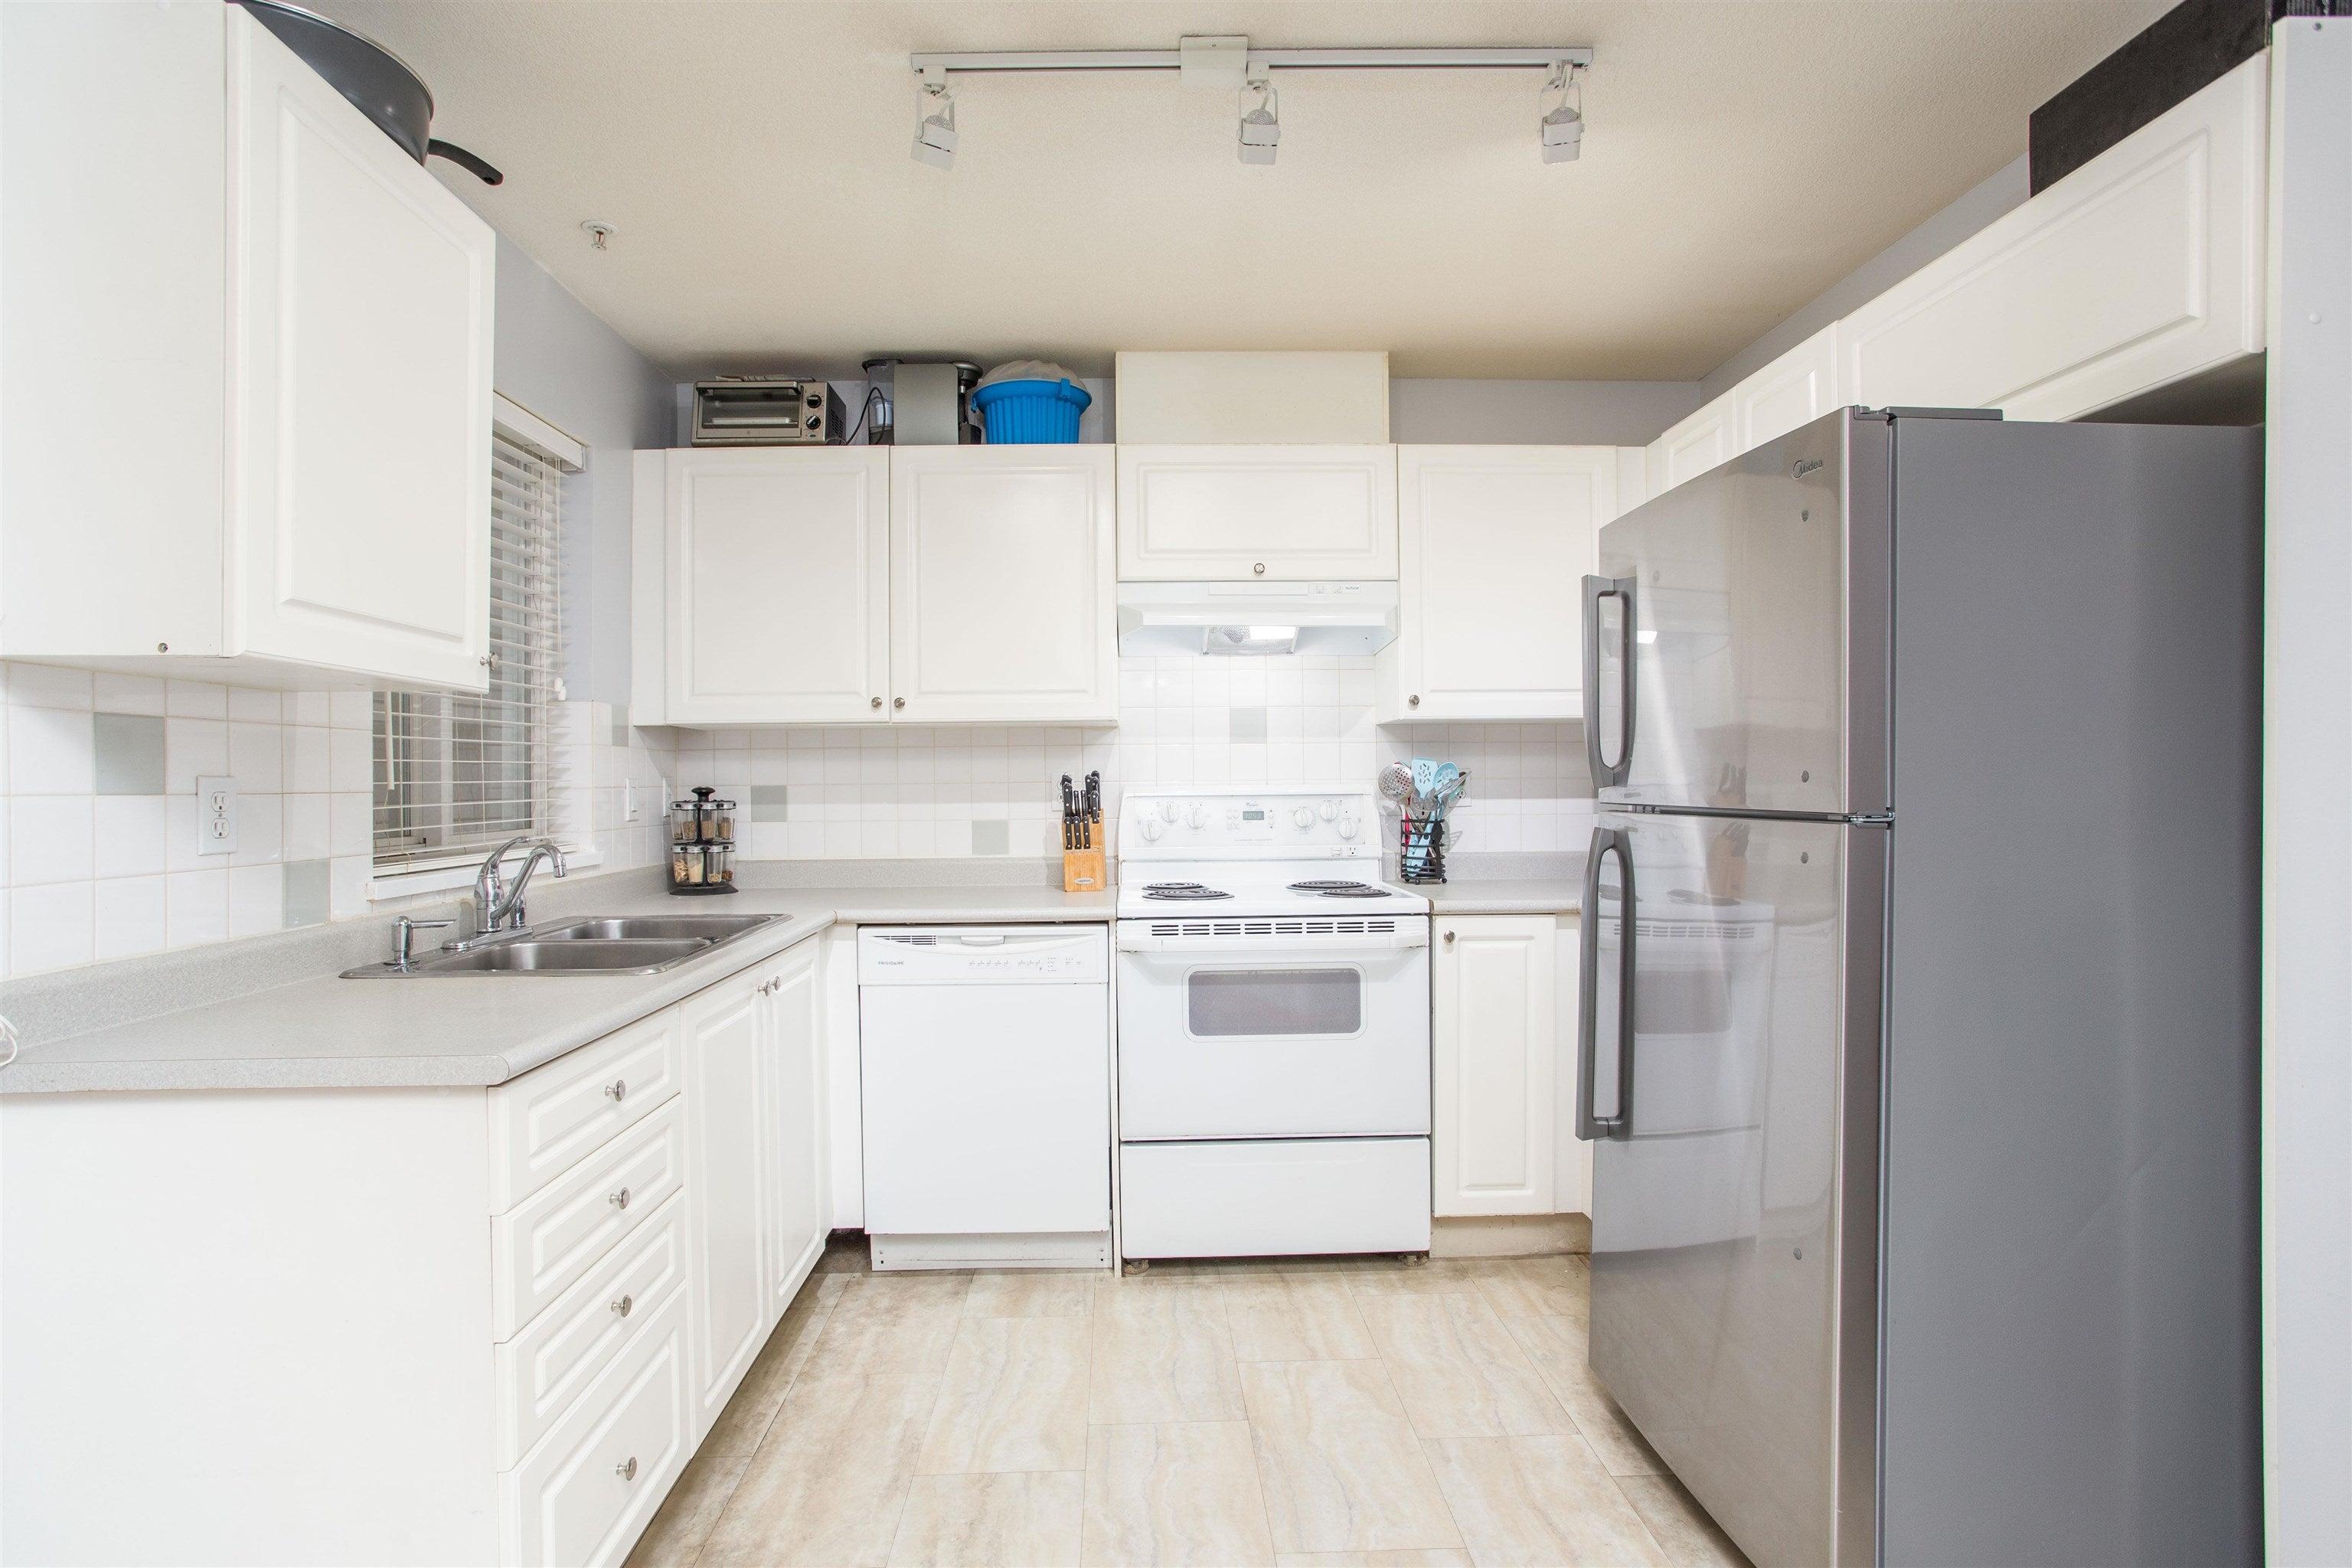 7 205 LEBLEU STREET - Maillardville Apartment/Condo for sale, 3 Bedrooms (R2625671) - #11